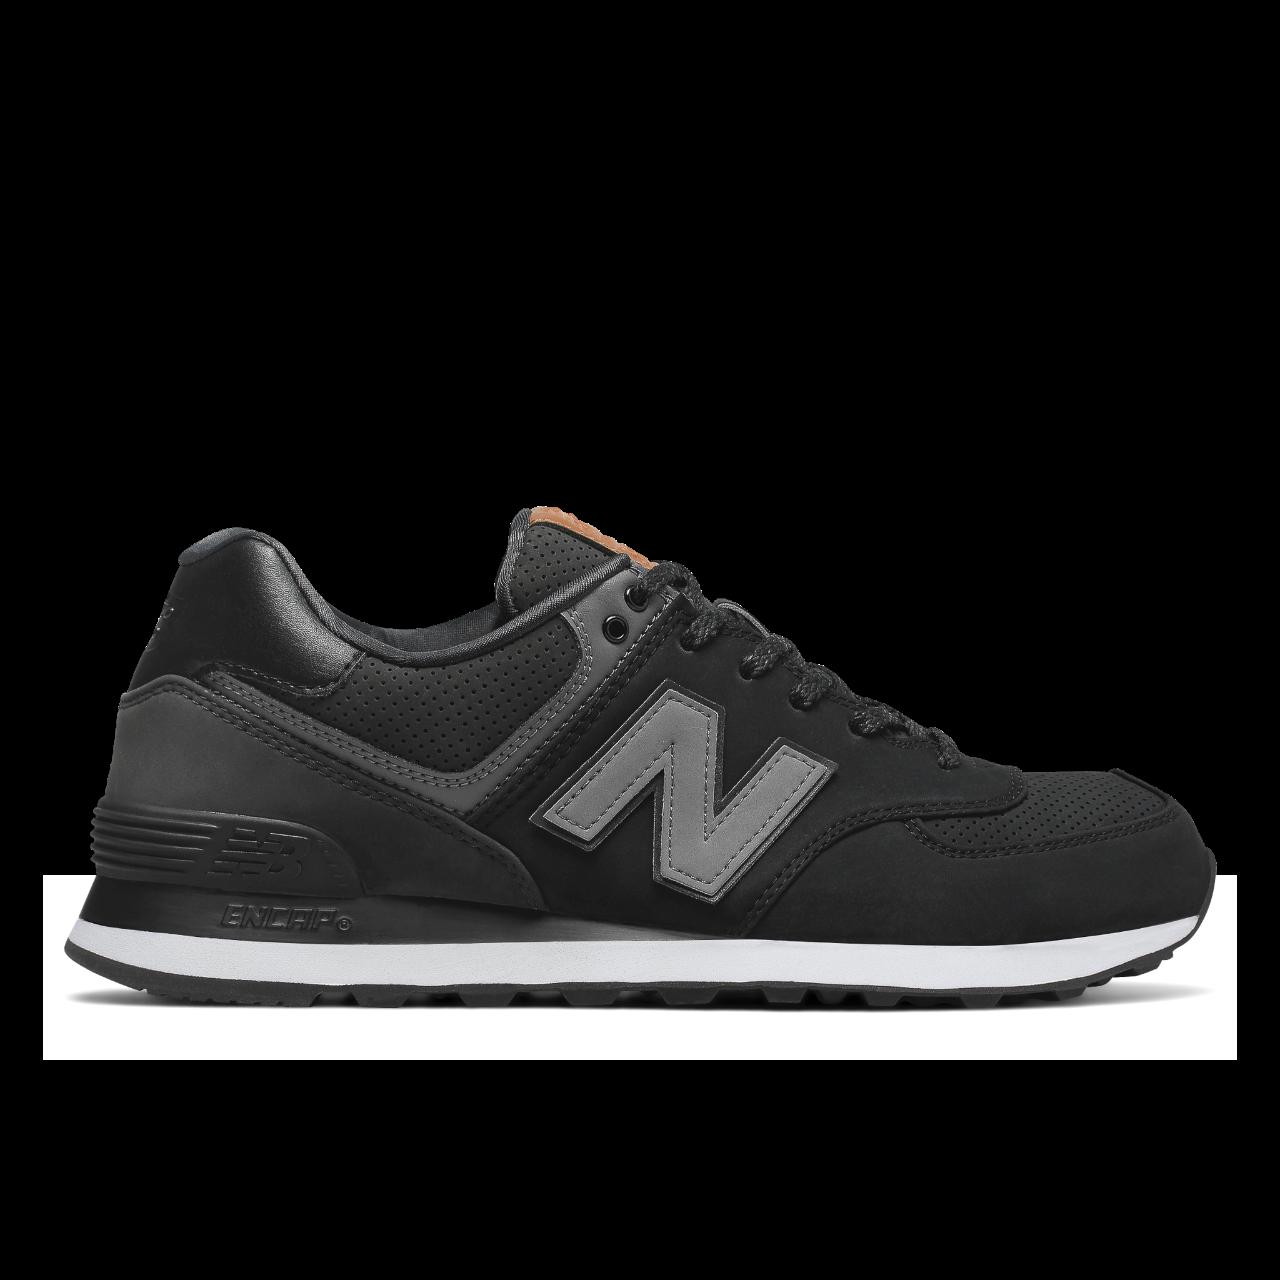 new balance 574 classics ml574gpg retro herren sneaker. Black Bedroom Furniture Sets. Home Design Ideas